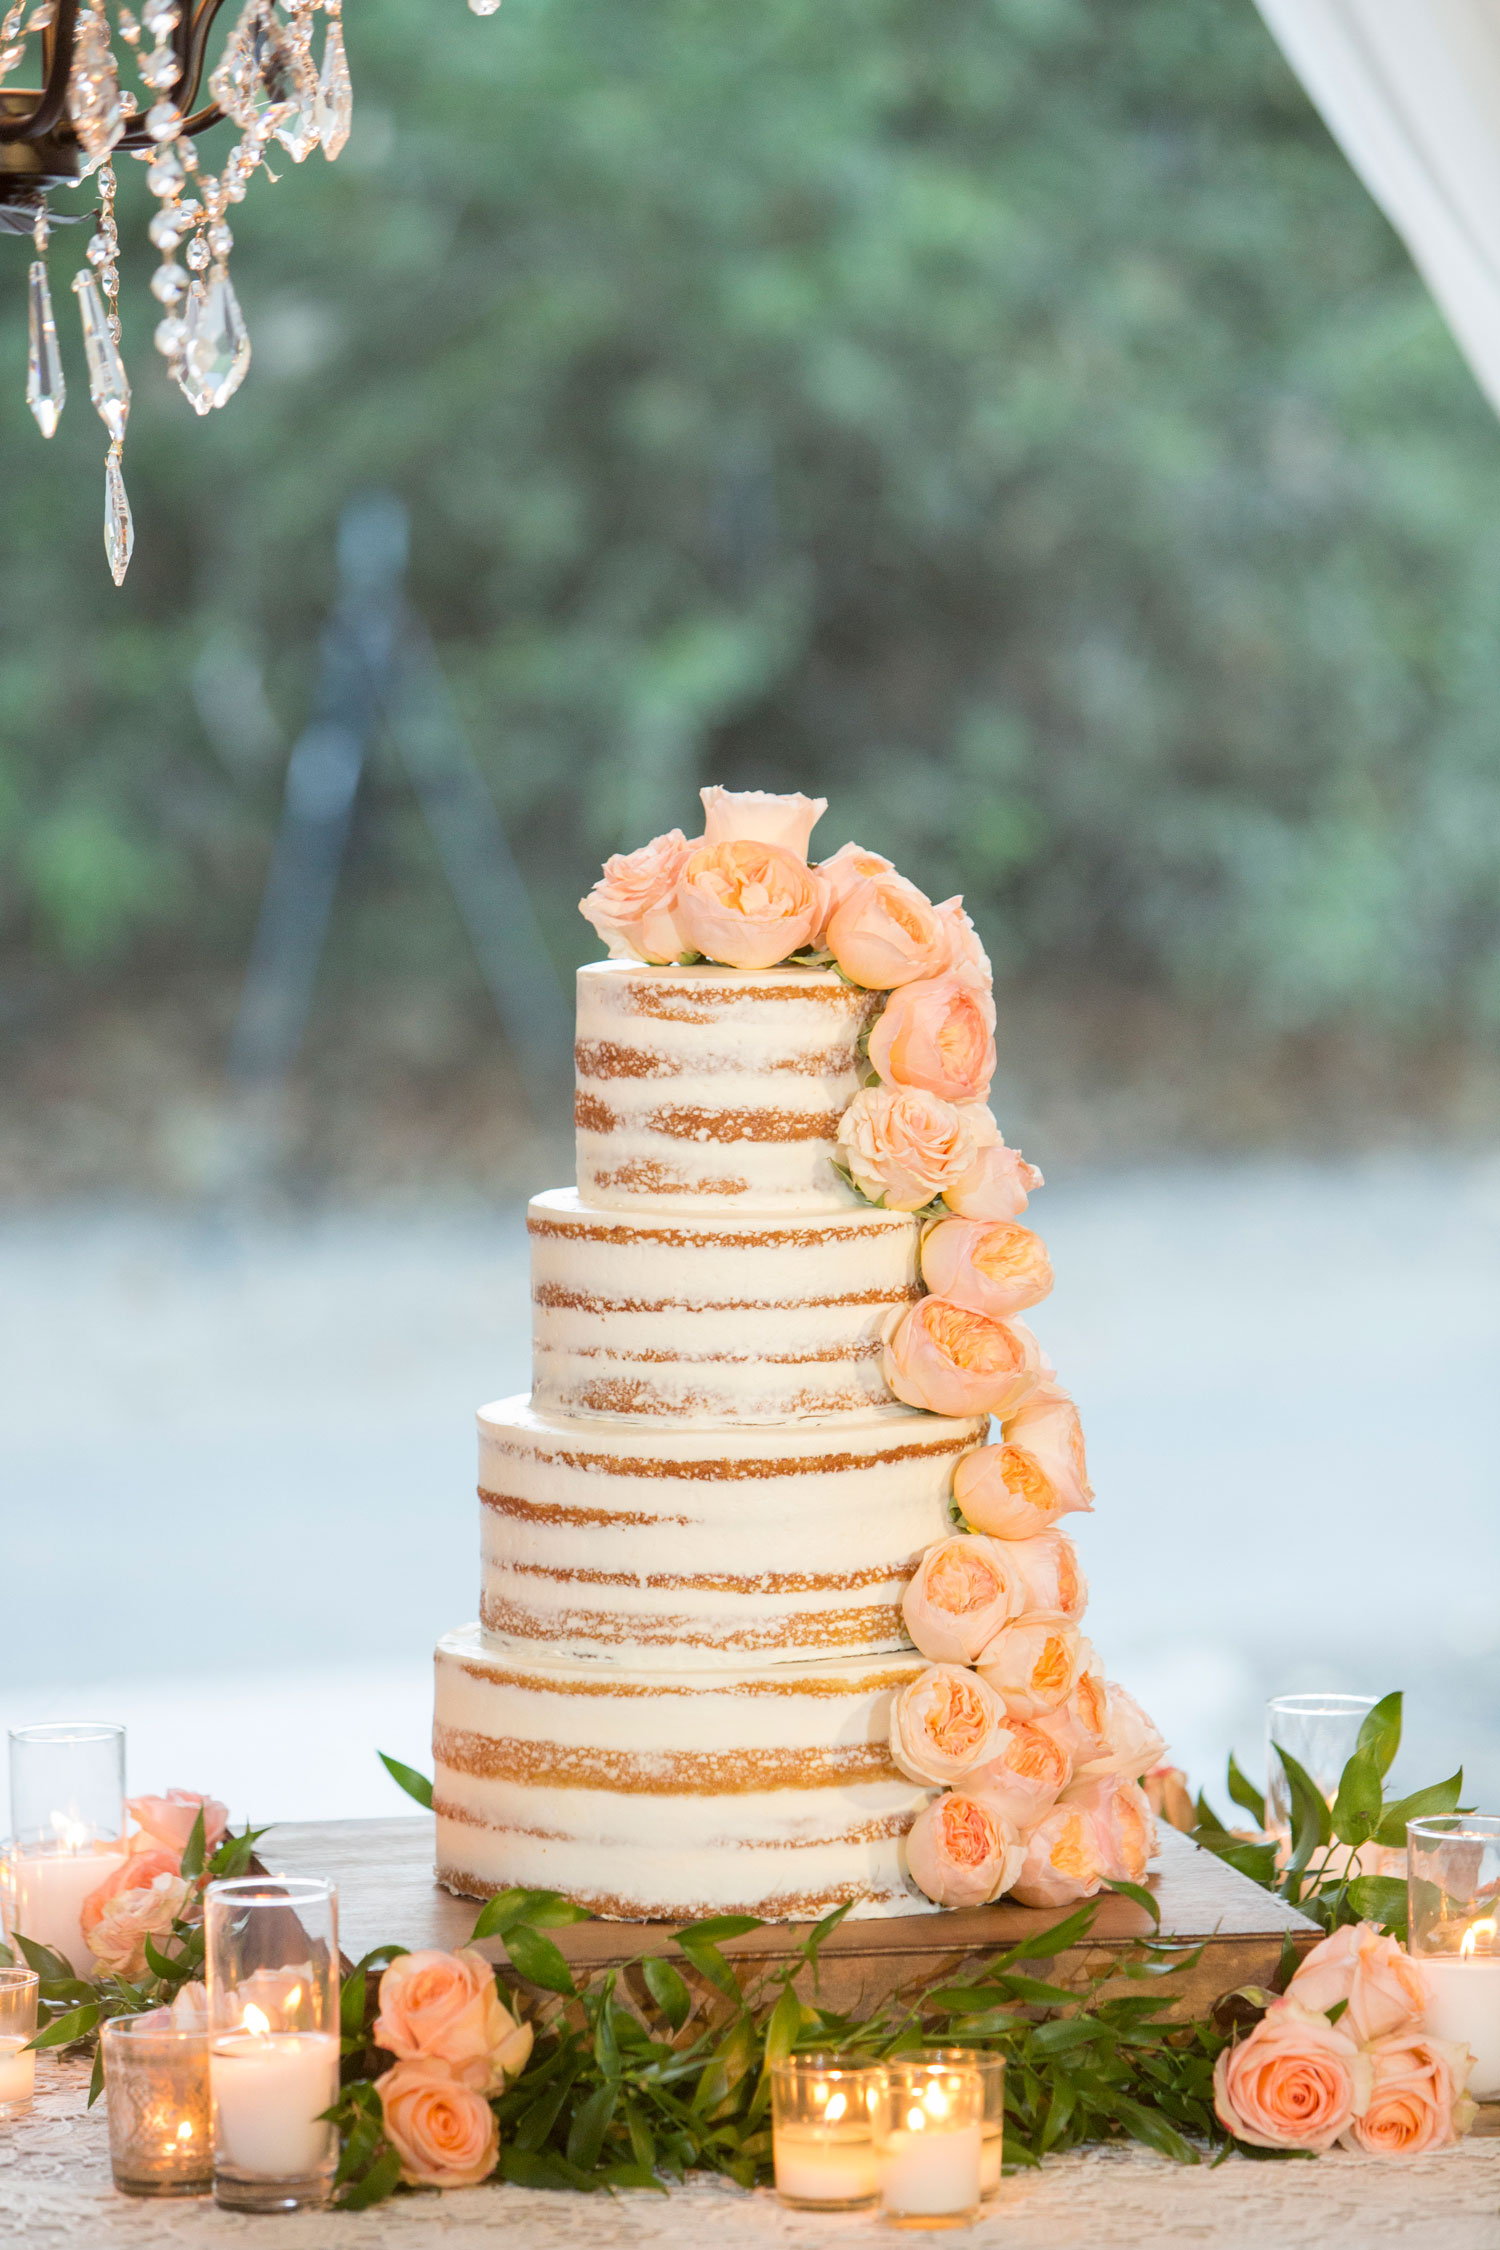 Rustic wedding cake ideas semi naked cake with fresh flowers